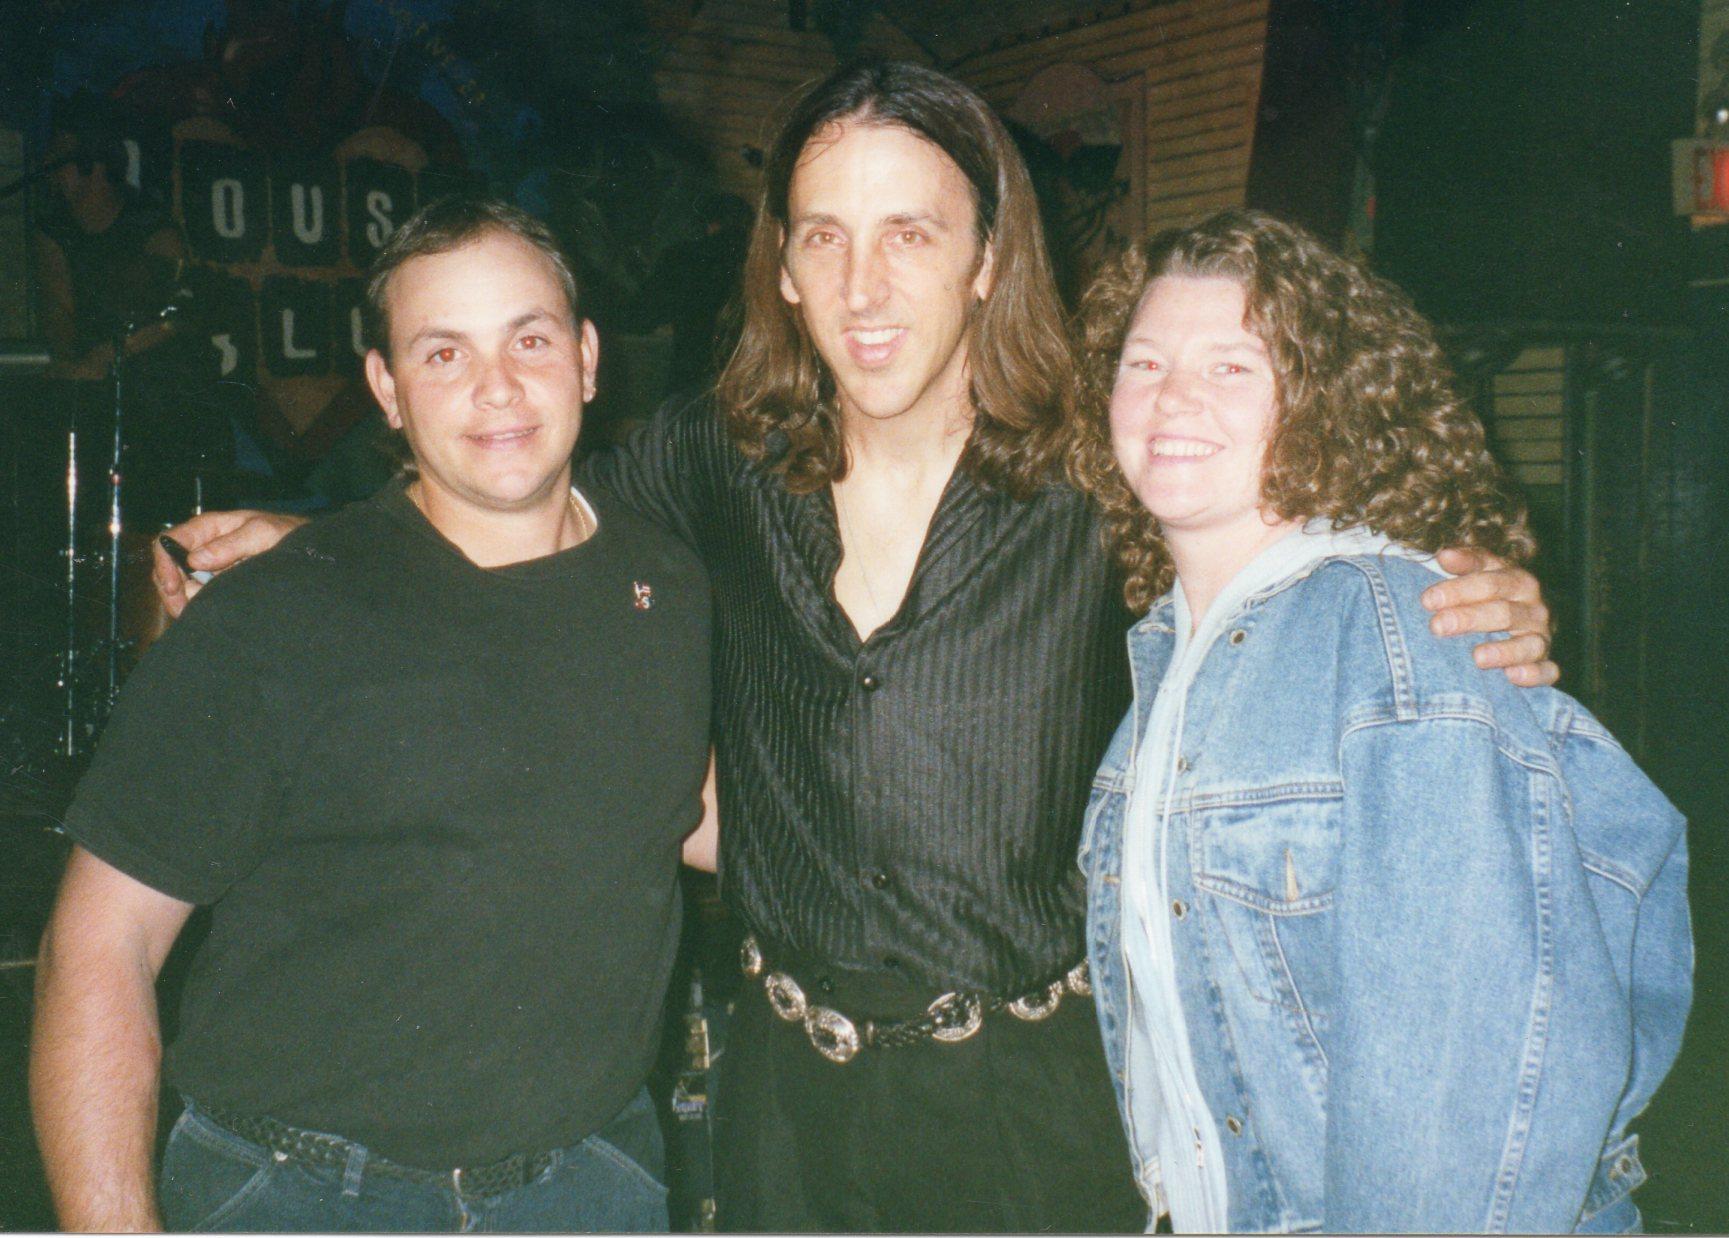 Jim Suhler & Wayne Cocorochio & Kathy Gillis